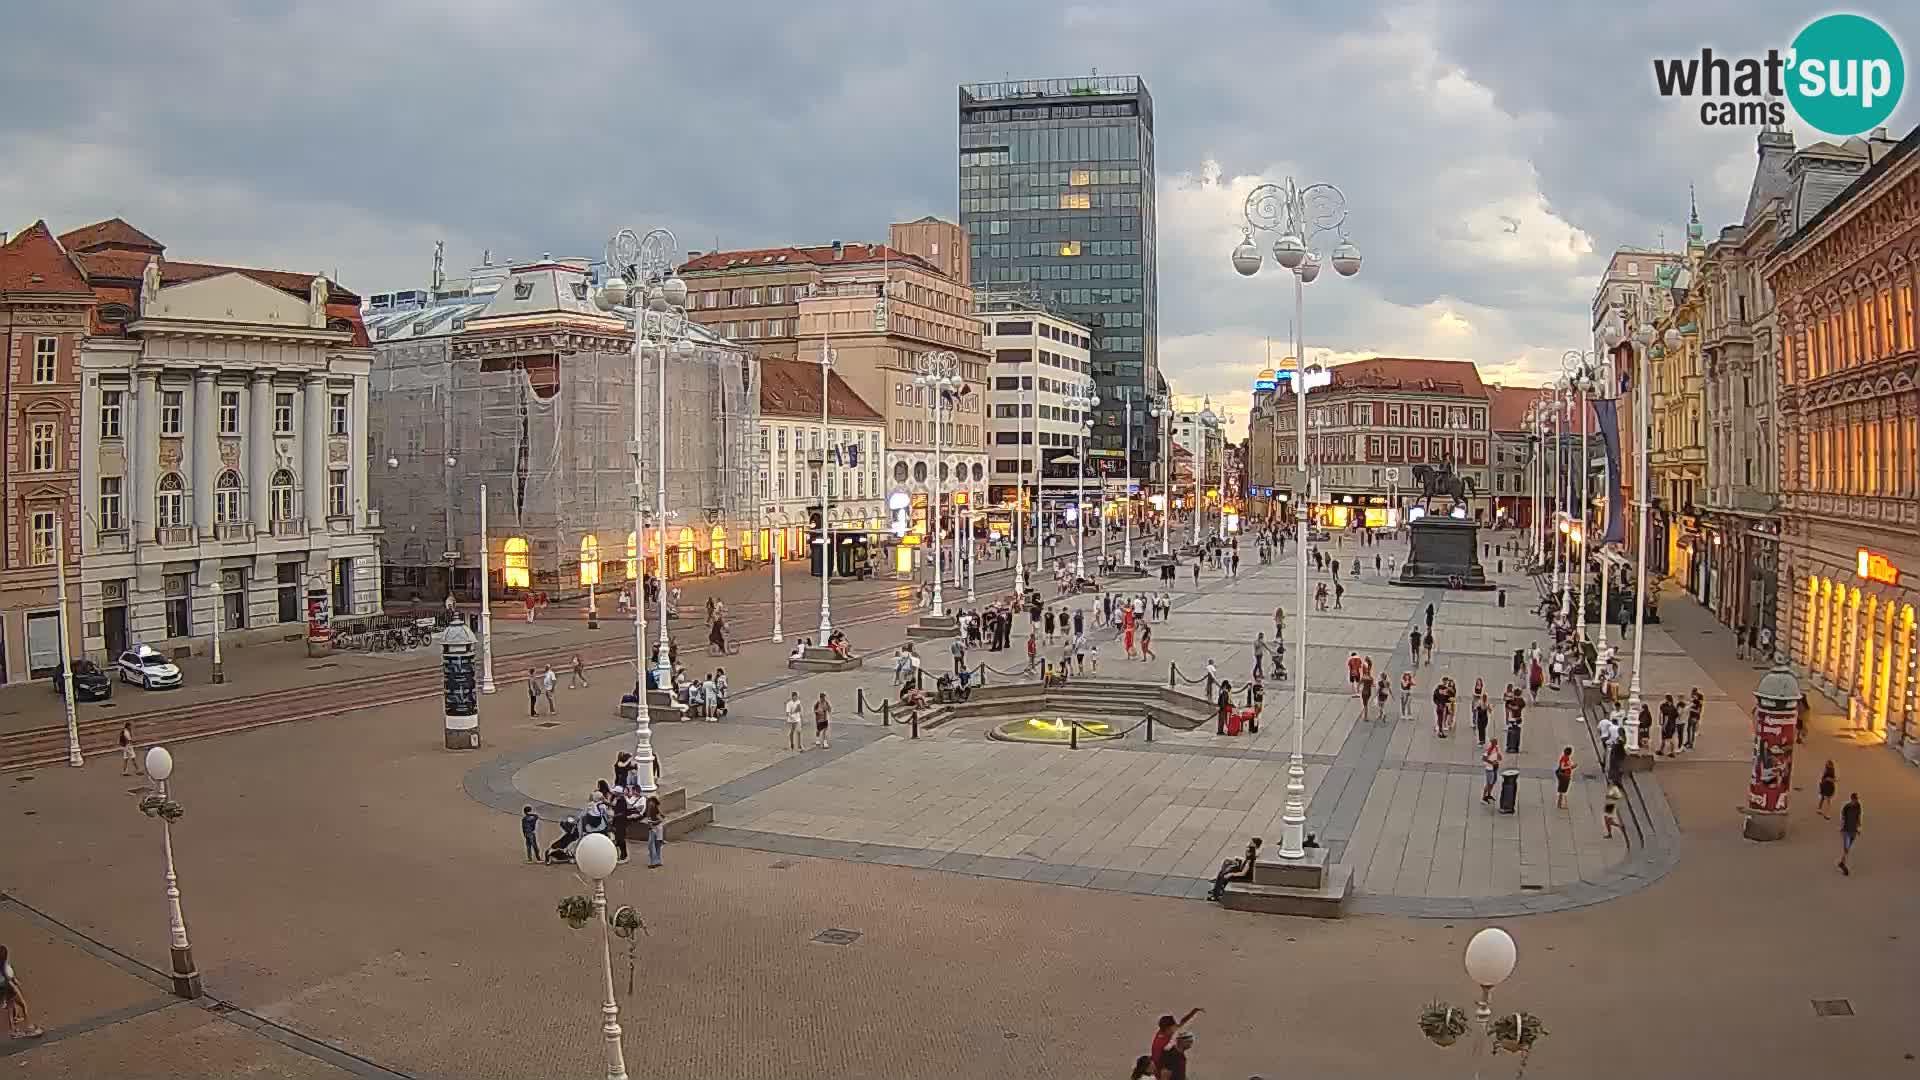 Zagreb Mon. 20:36